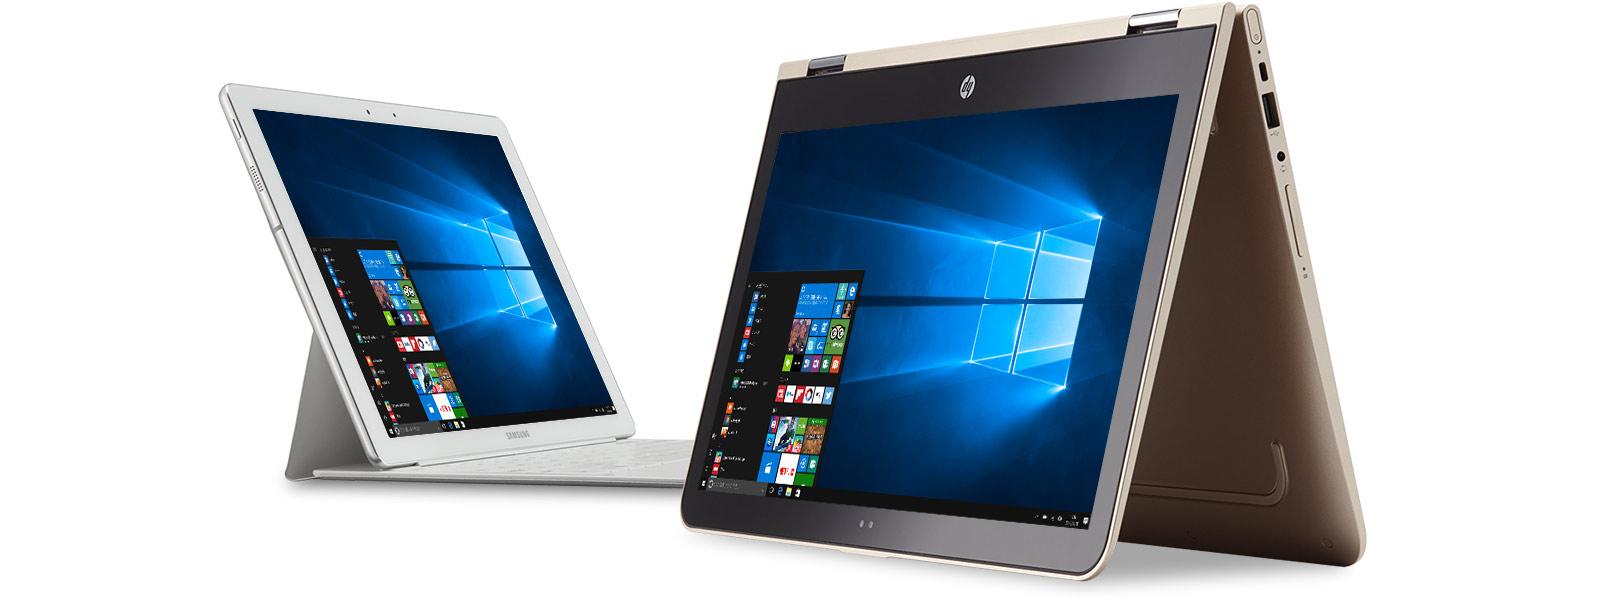 Windows スタート メニューが表示された Microsoft デバイス